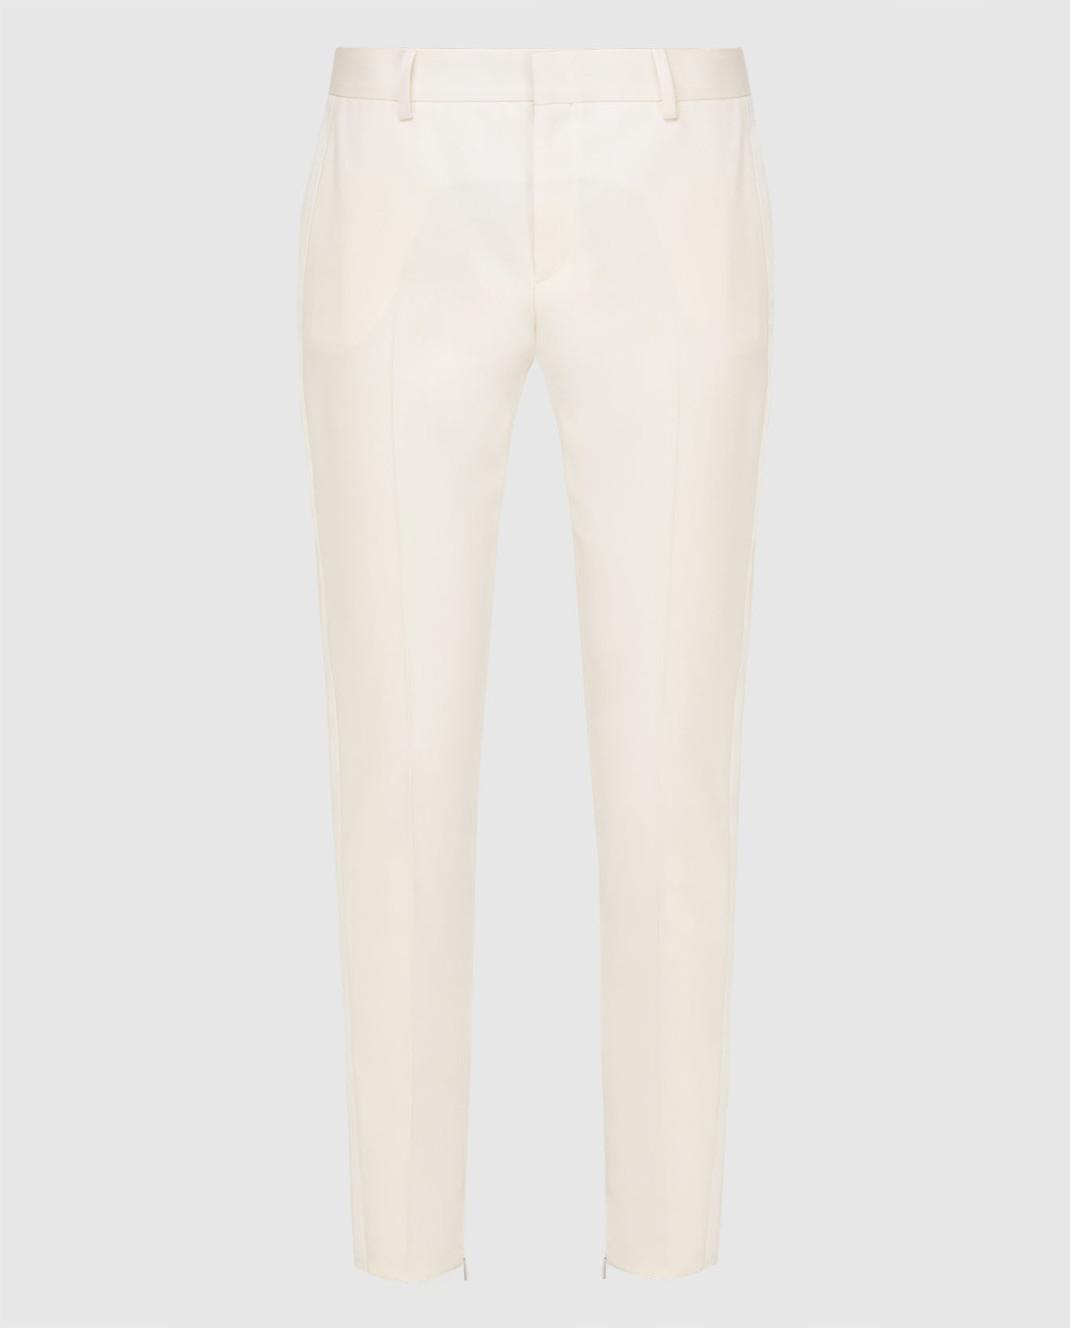 Saint Laurent Светло-бежевые брюки из шерсти 516111